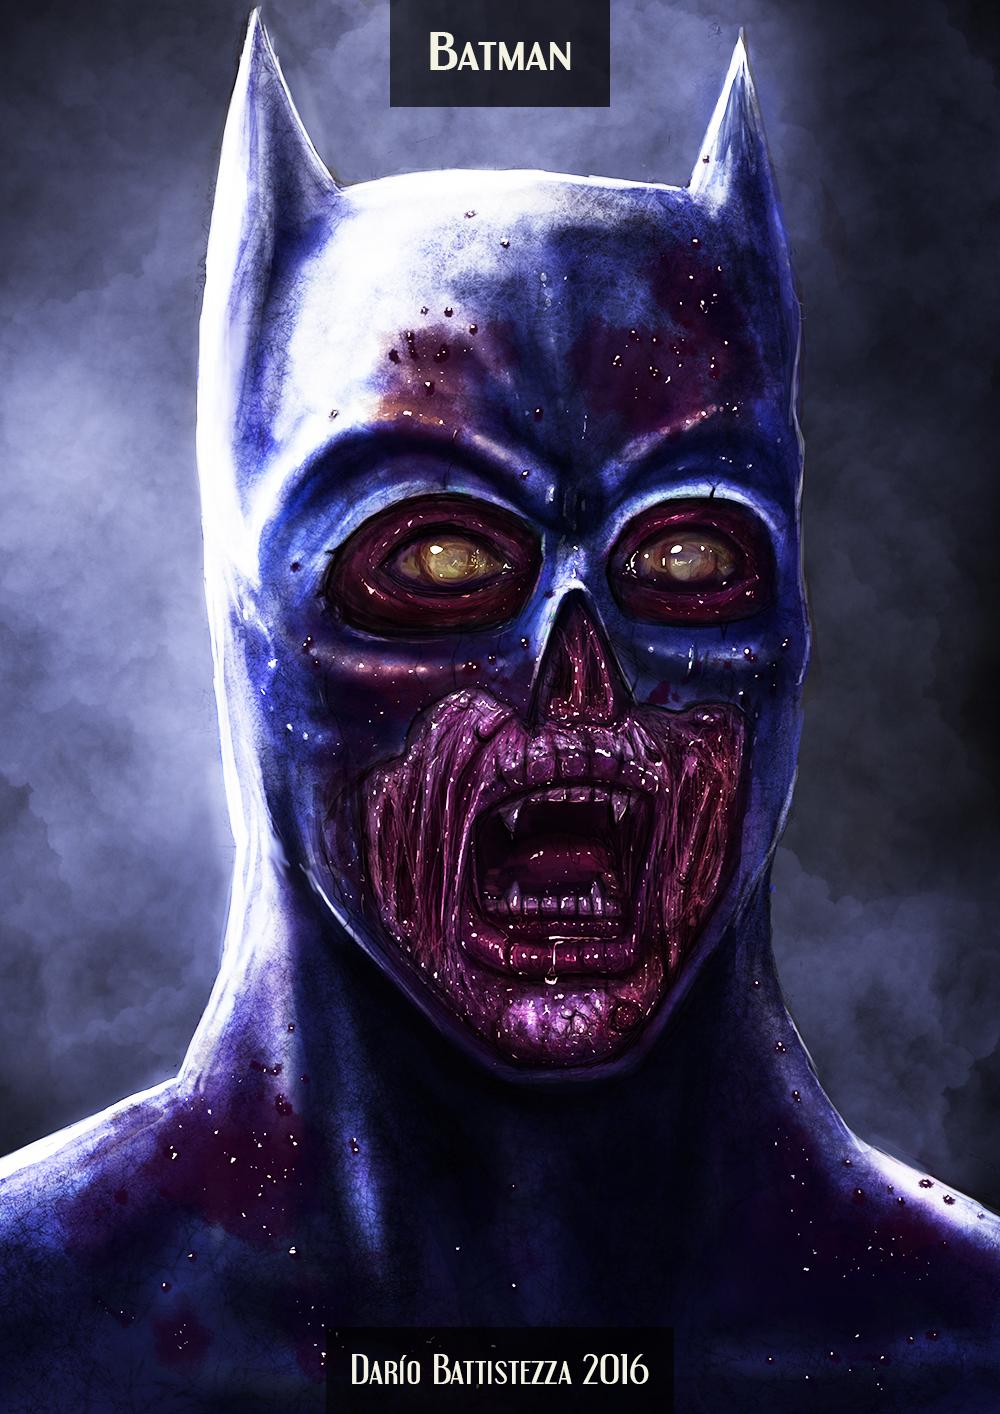 Batman turned into a zombie !!